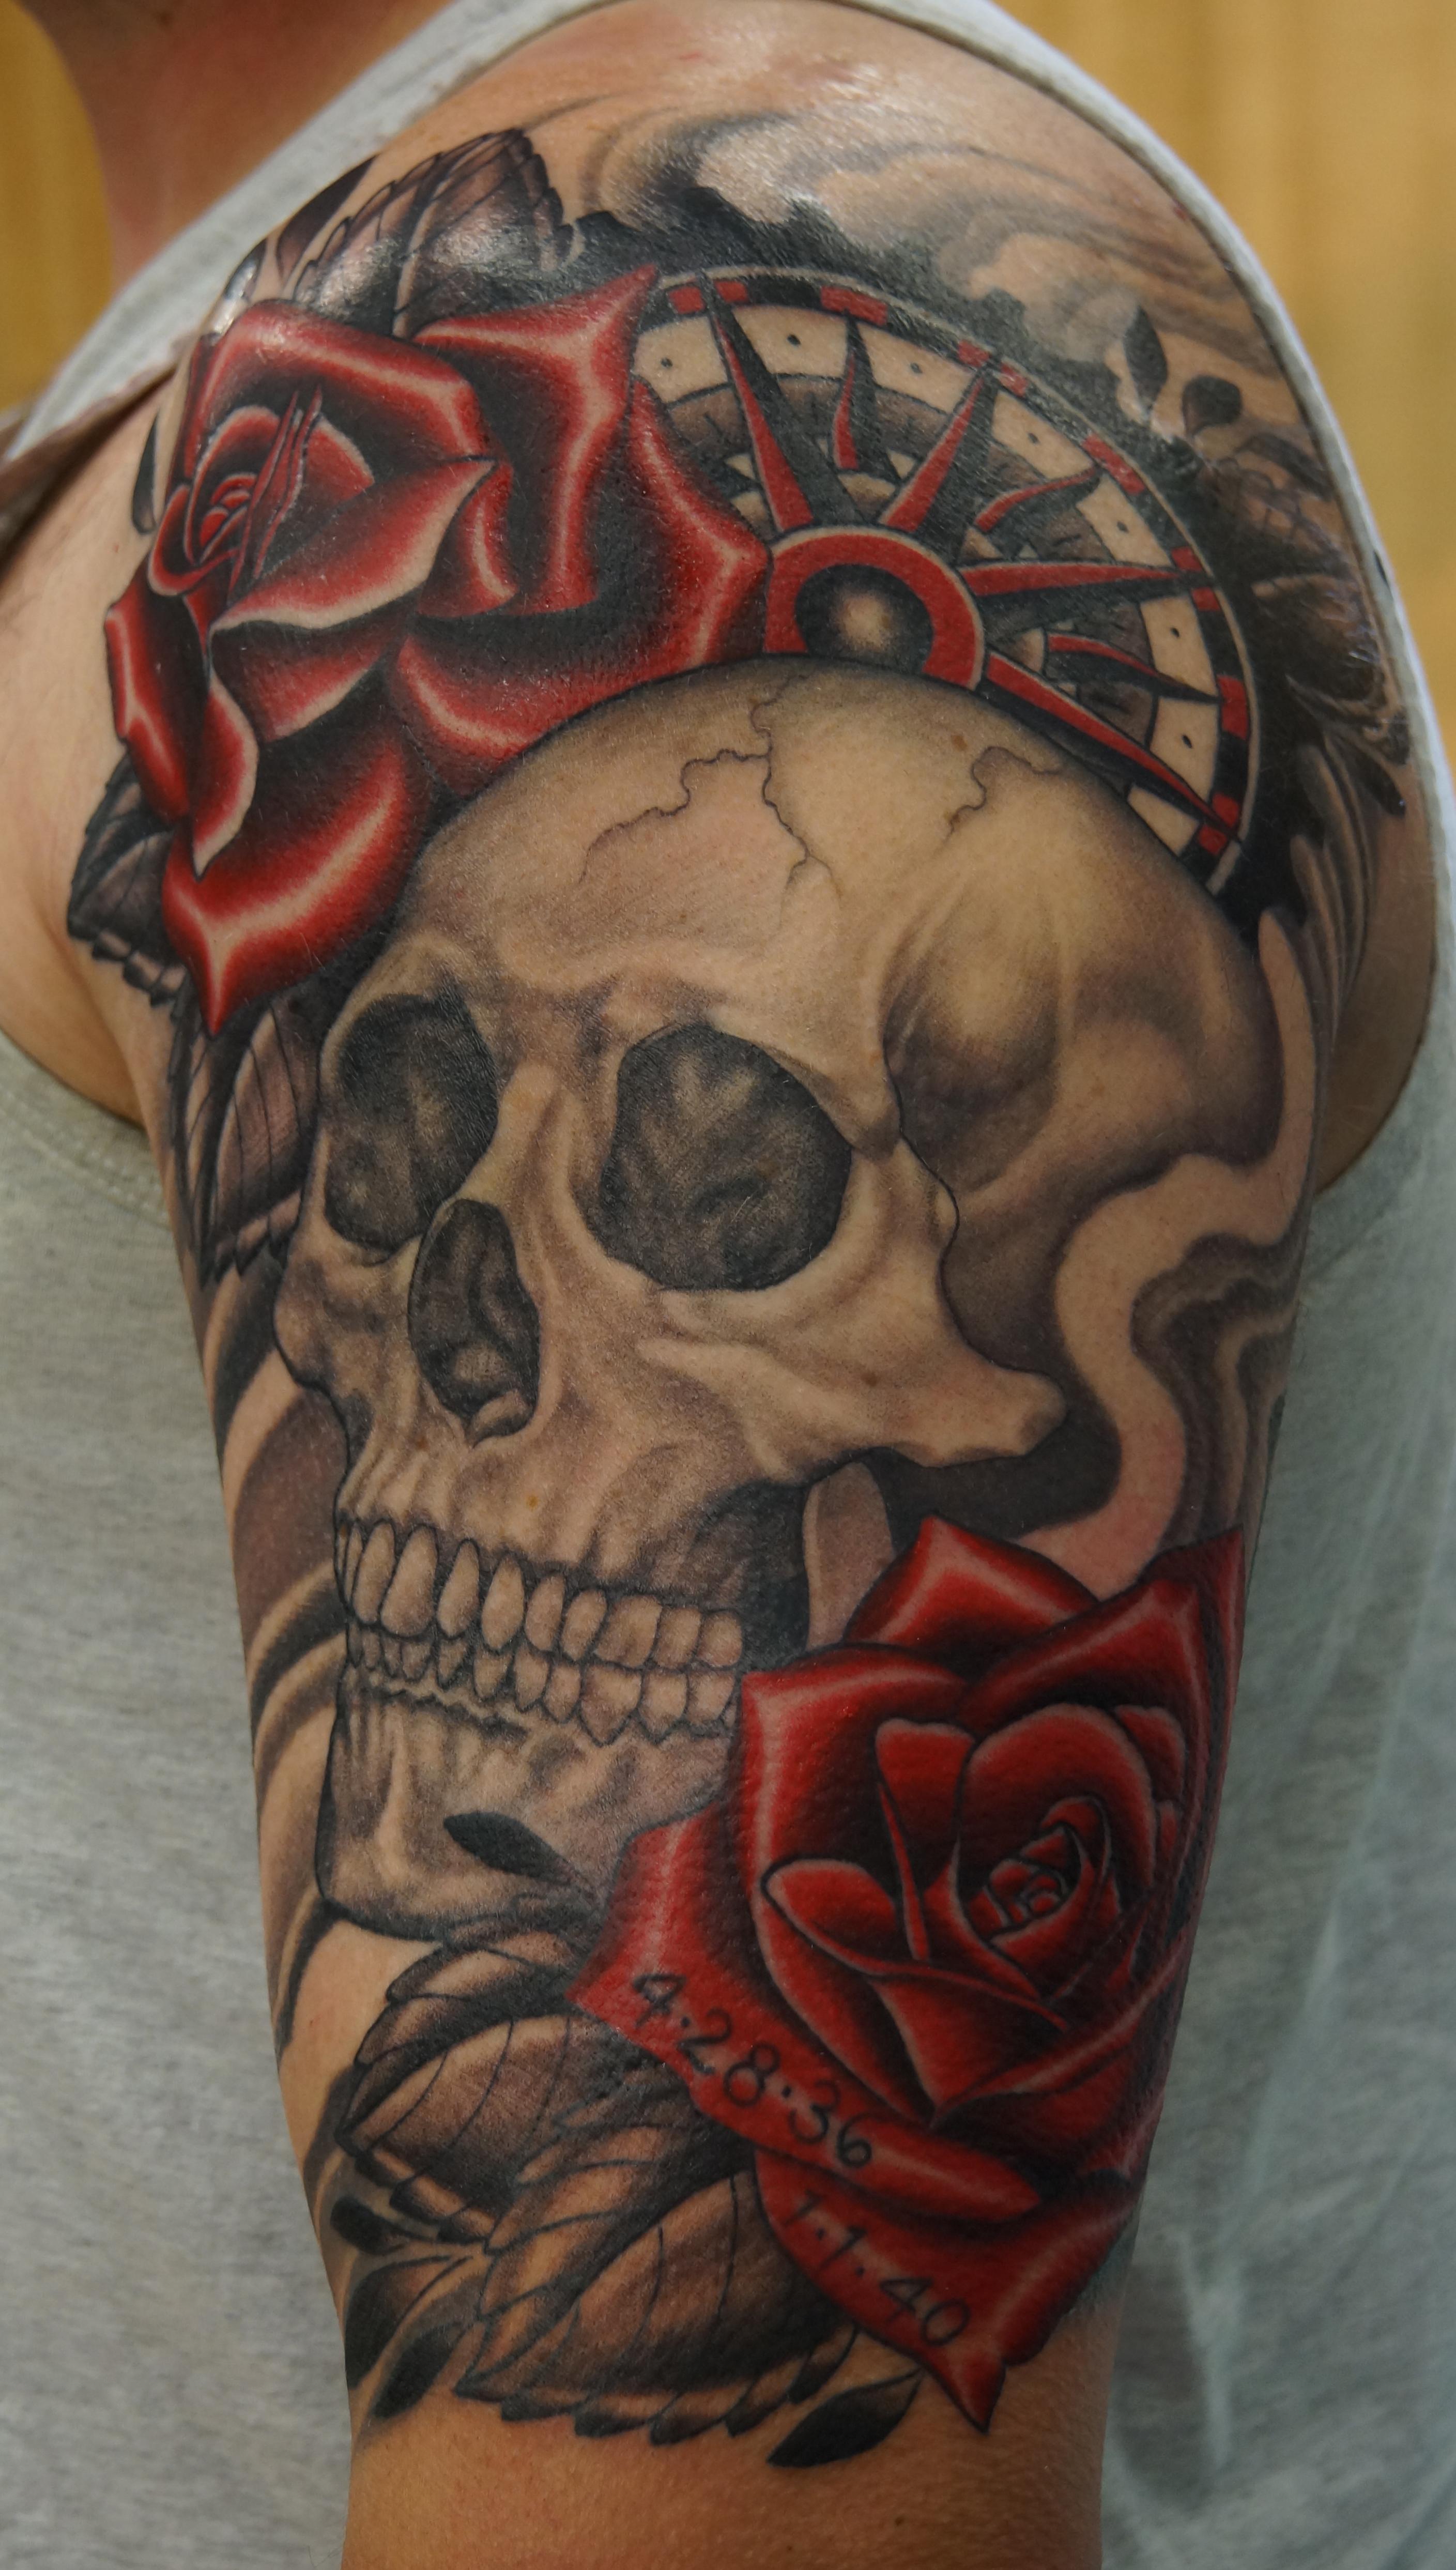 Skull, Roses, Compass